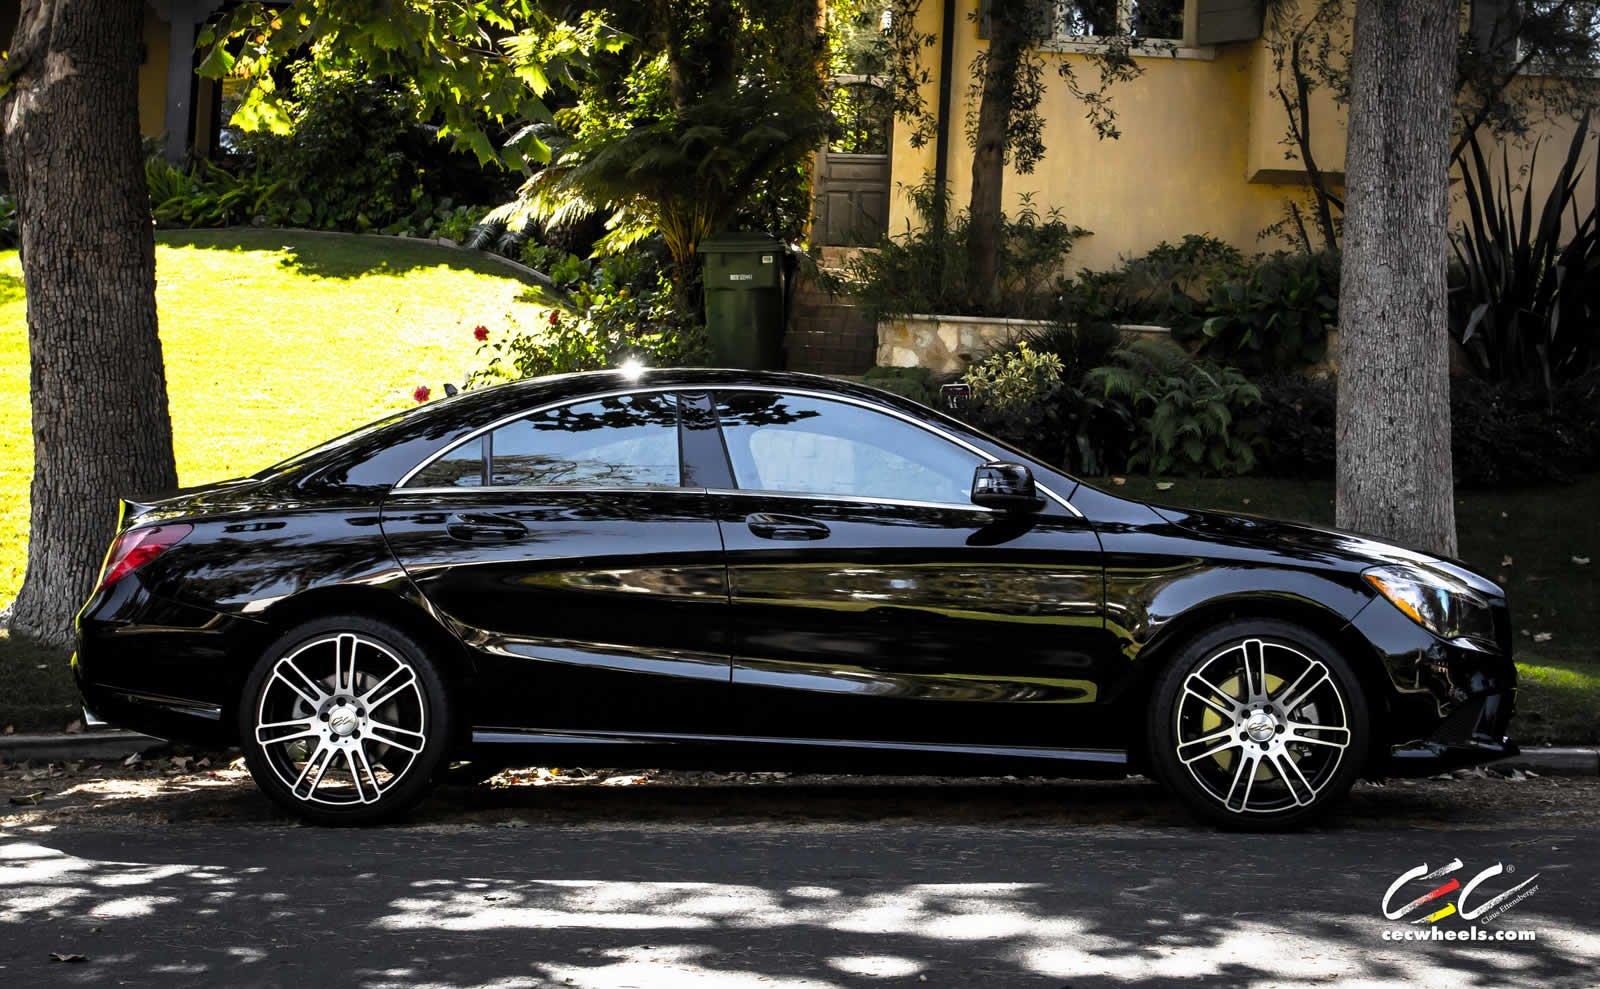 2015 cec wheels tuning cars mercedes benz cla 250. Black Bedroom Furniture Sets. Home Design Ideas